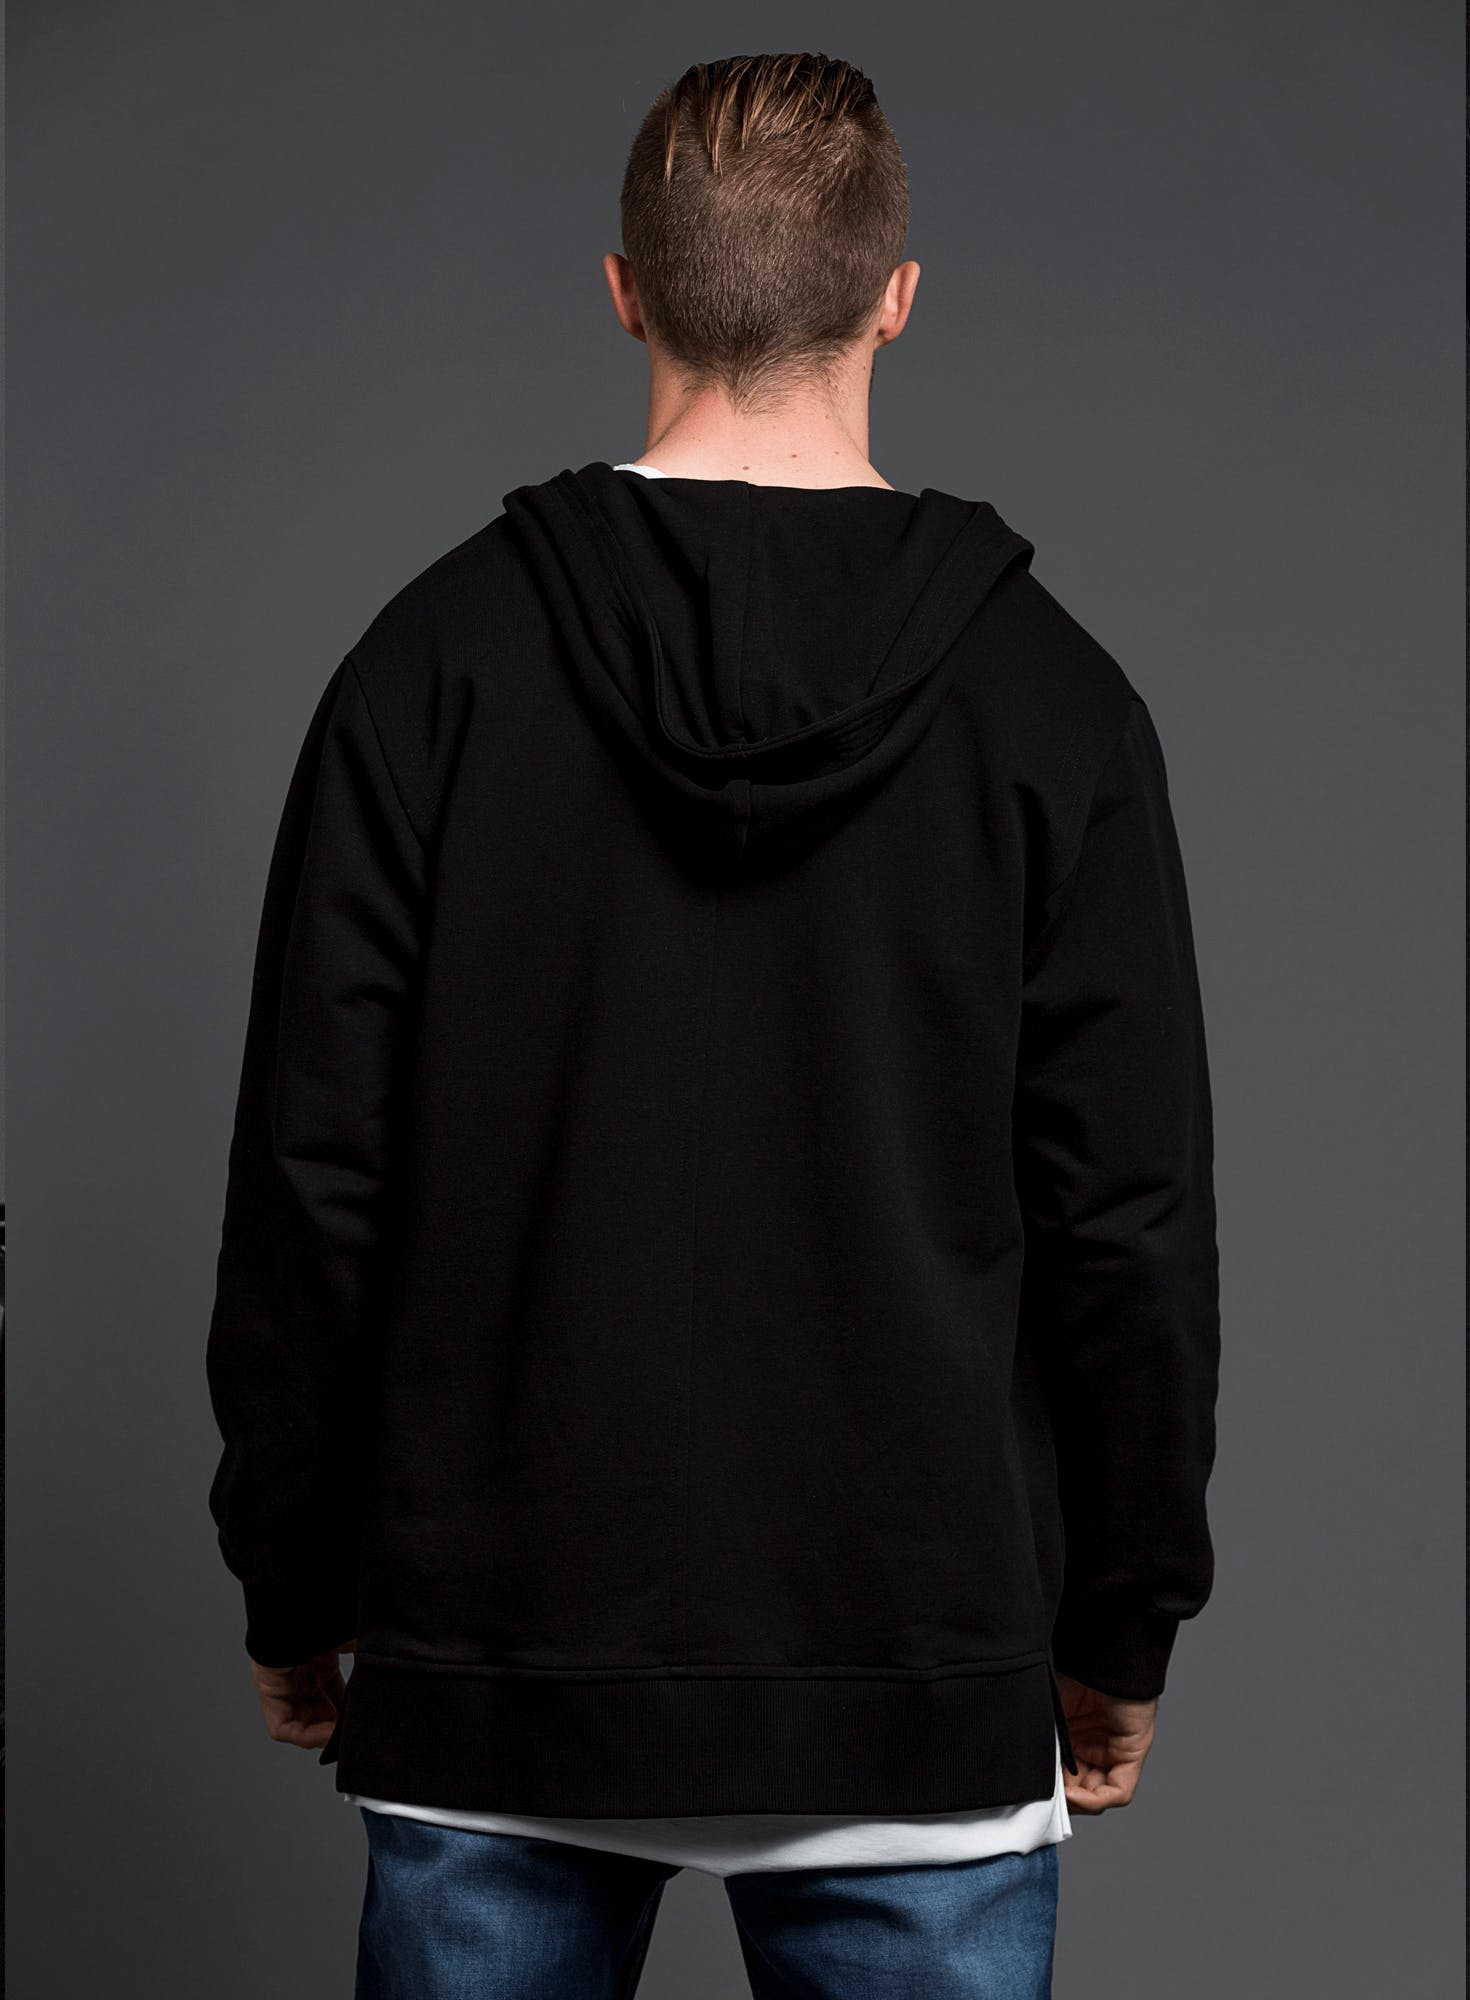 Gi Sweatshirt Bonus Image